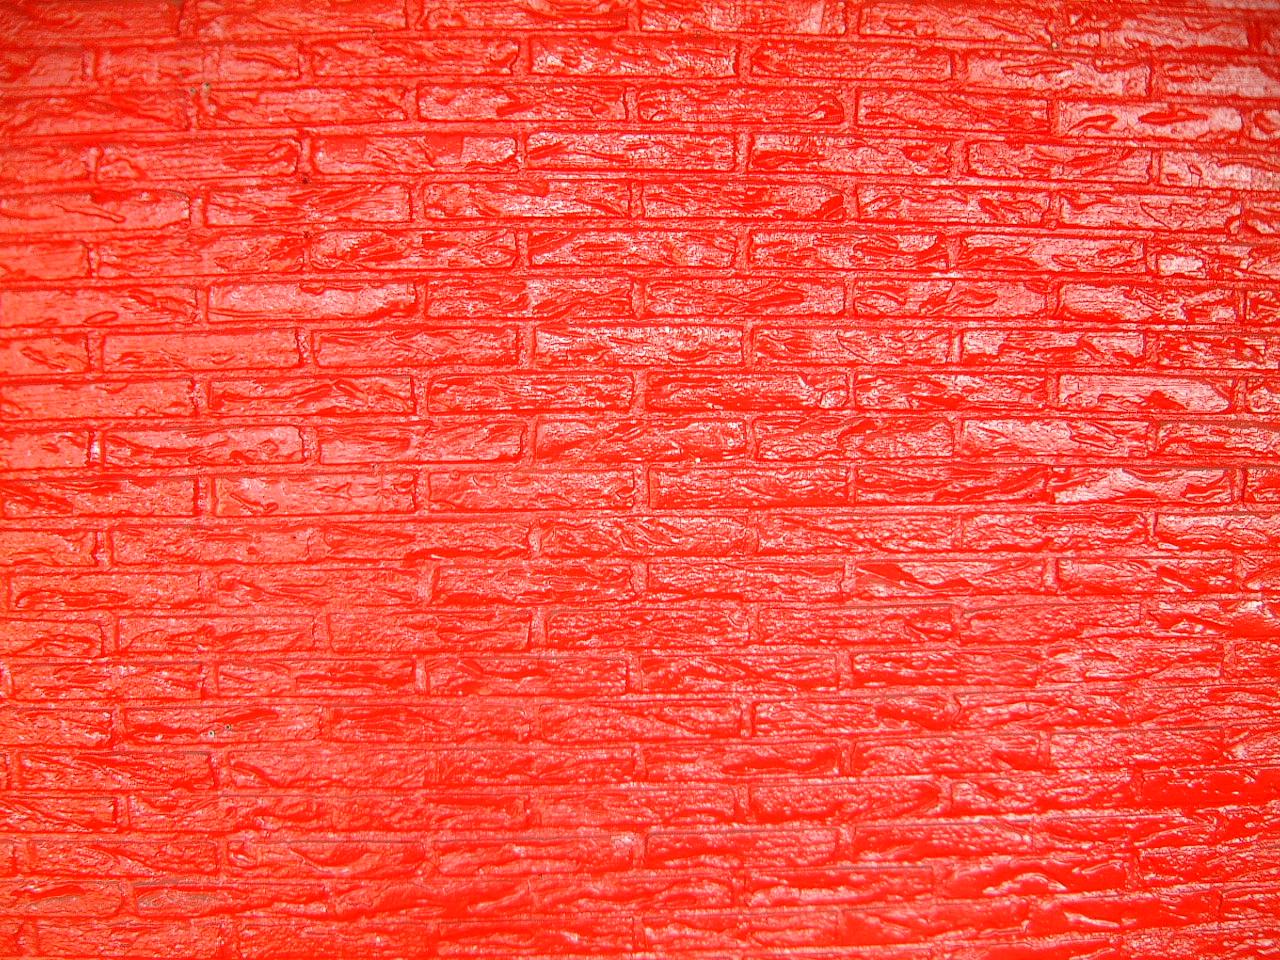 Image After Textures Maartent Wall Bricks Paint